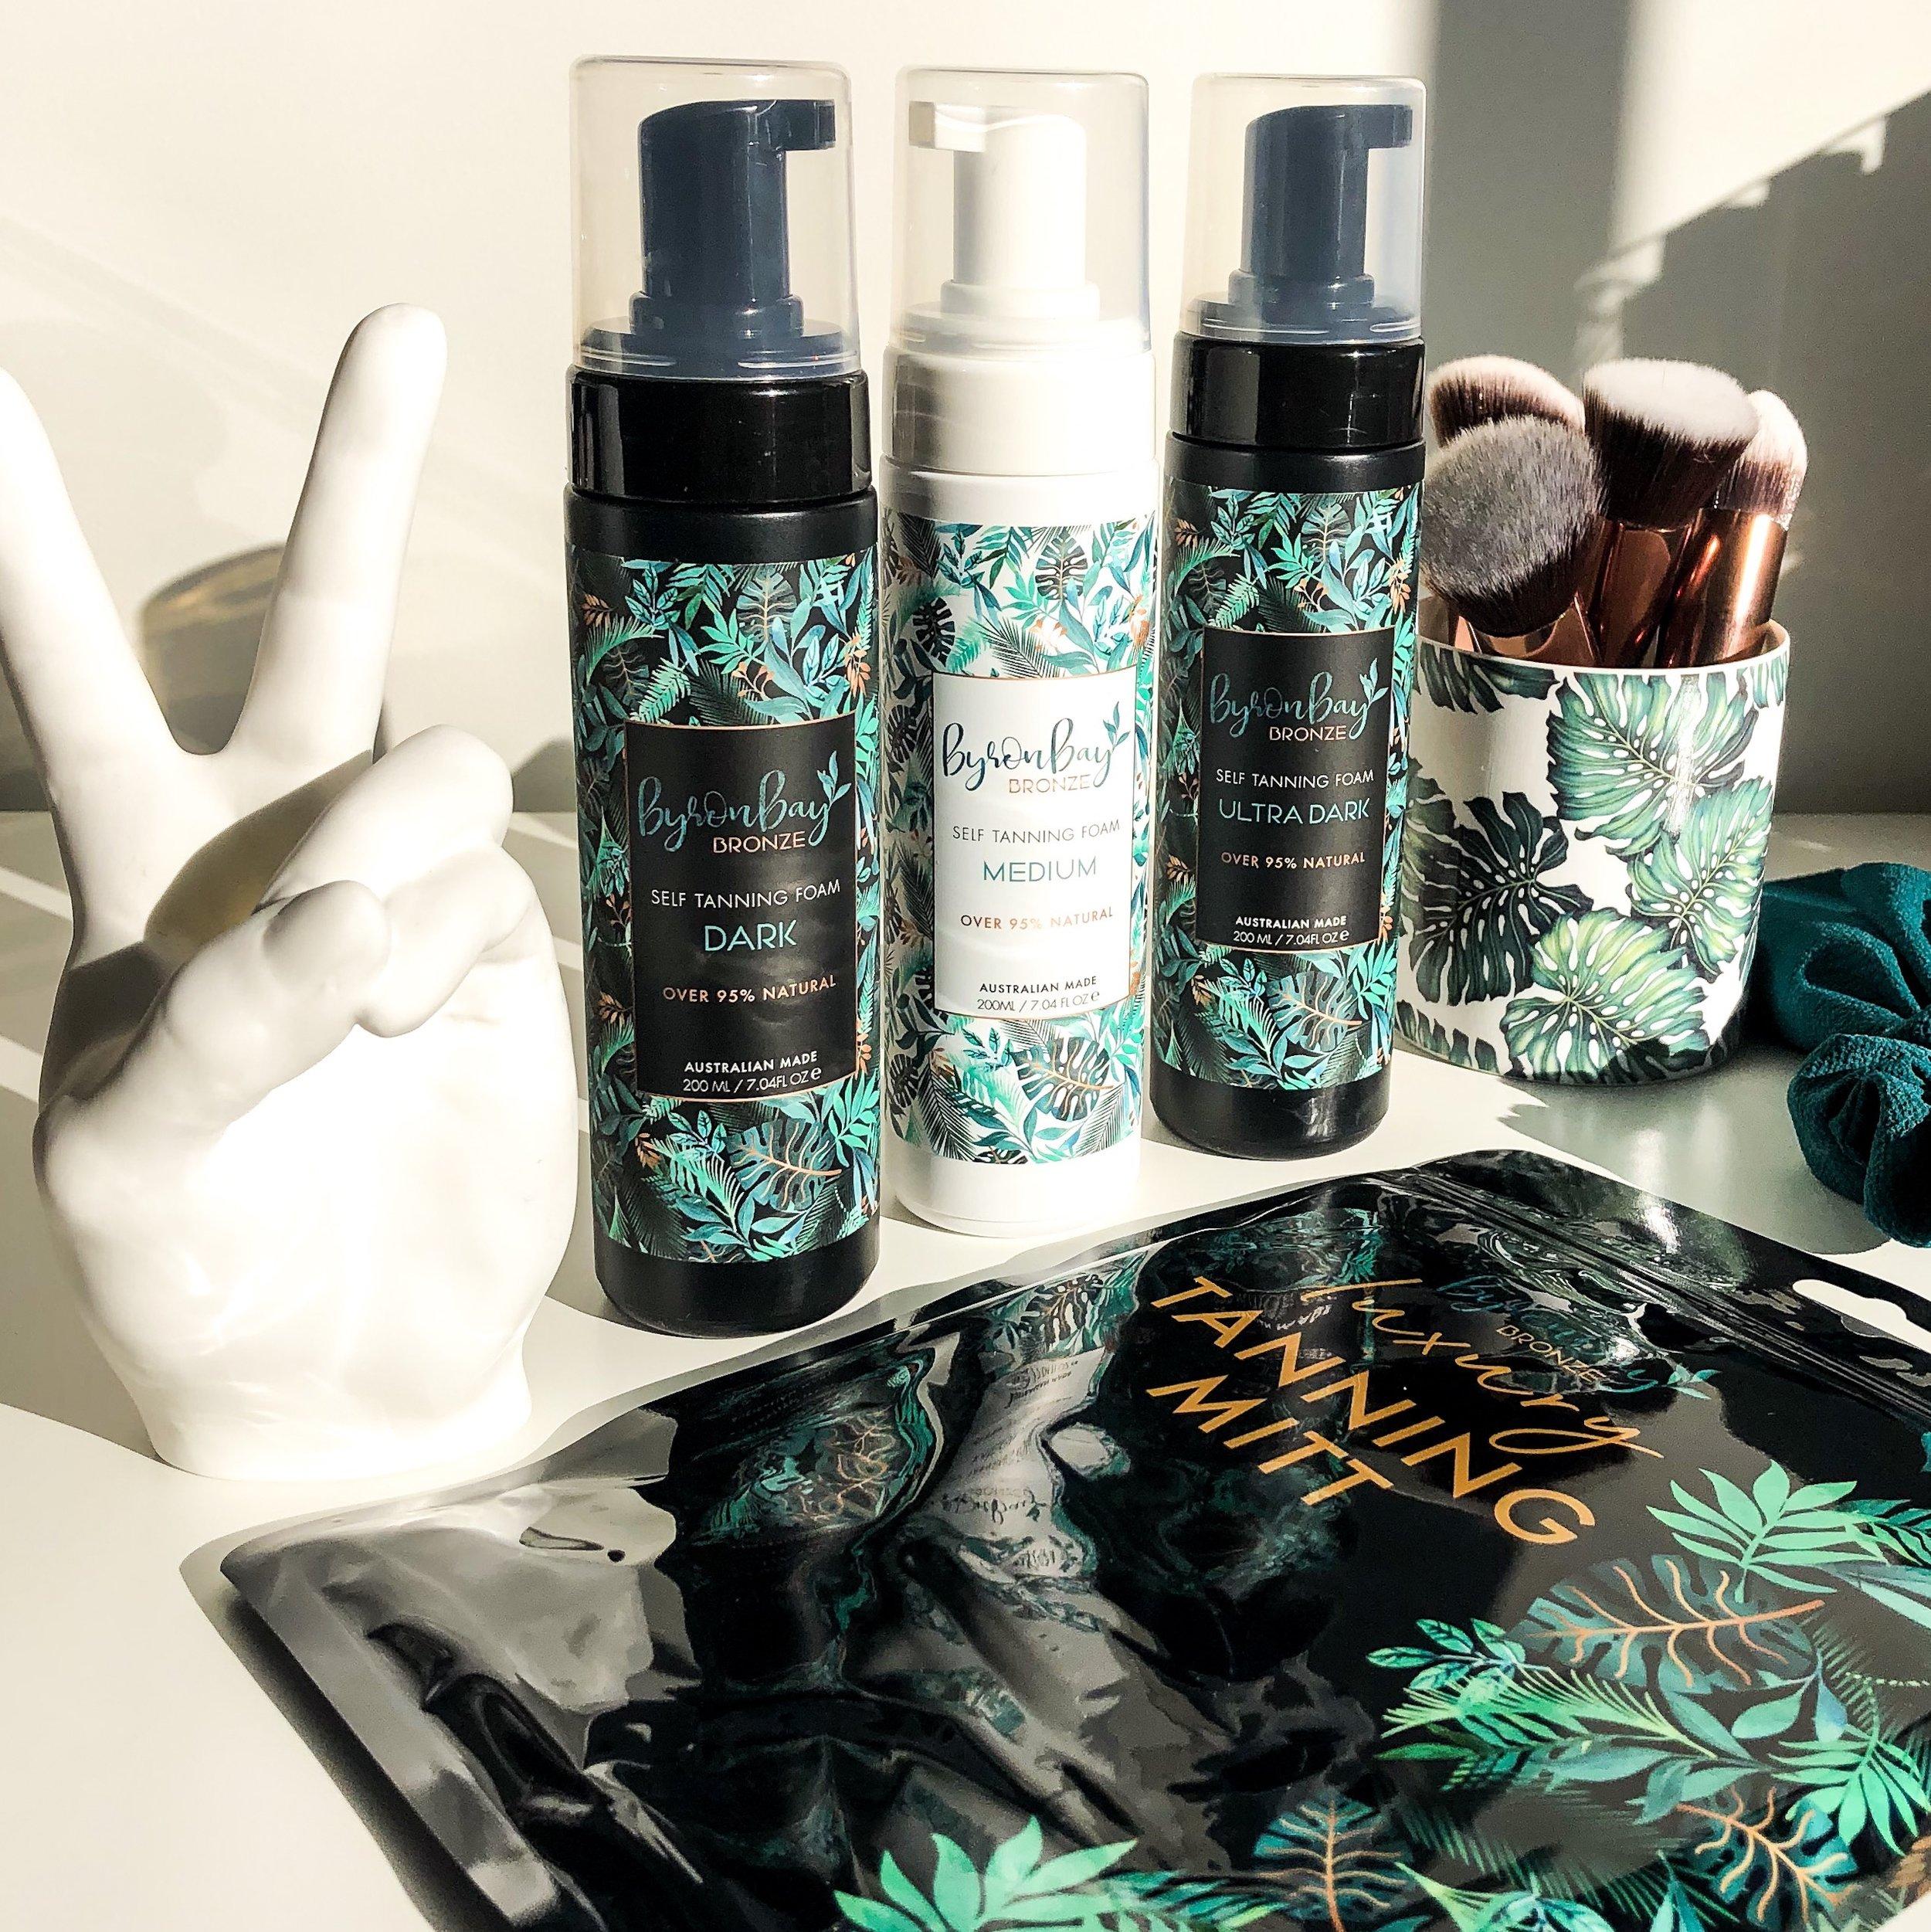 Byron Bay Bronze Tan Review - Marisa Robinson Beauty